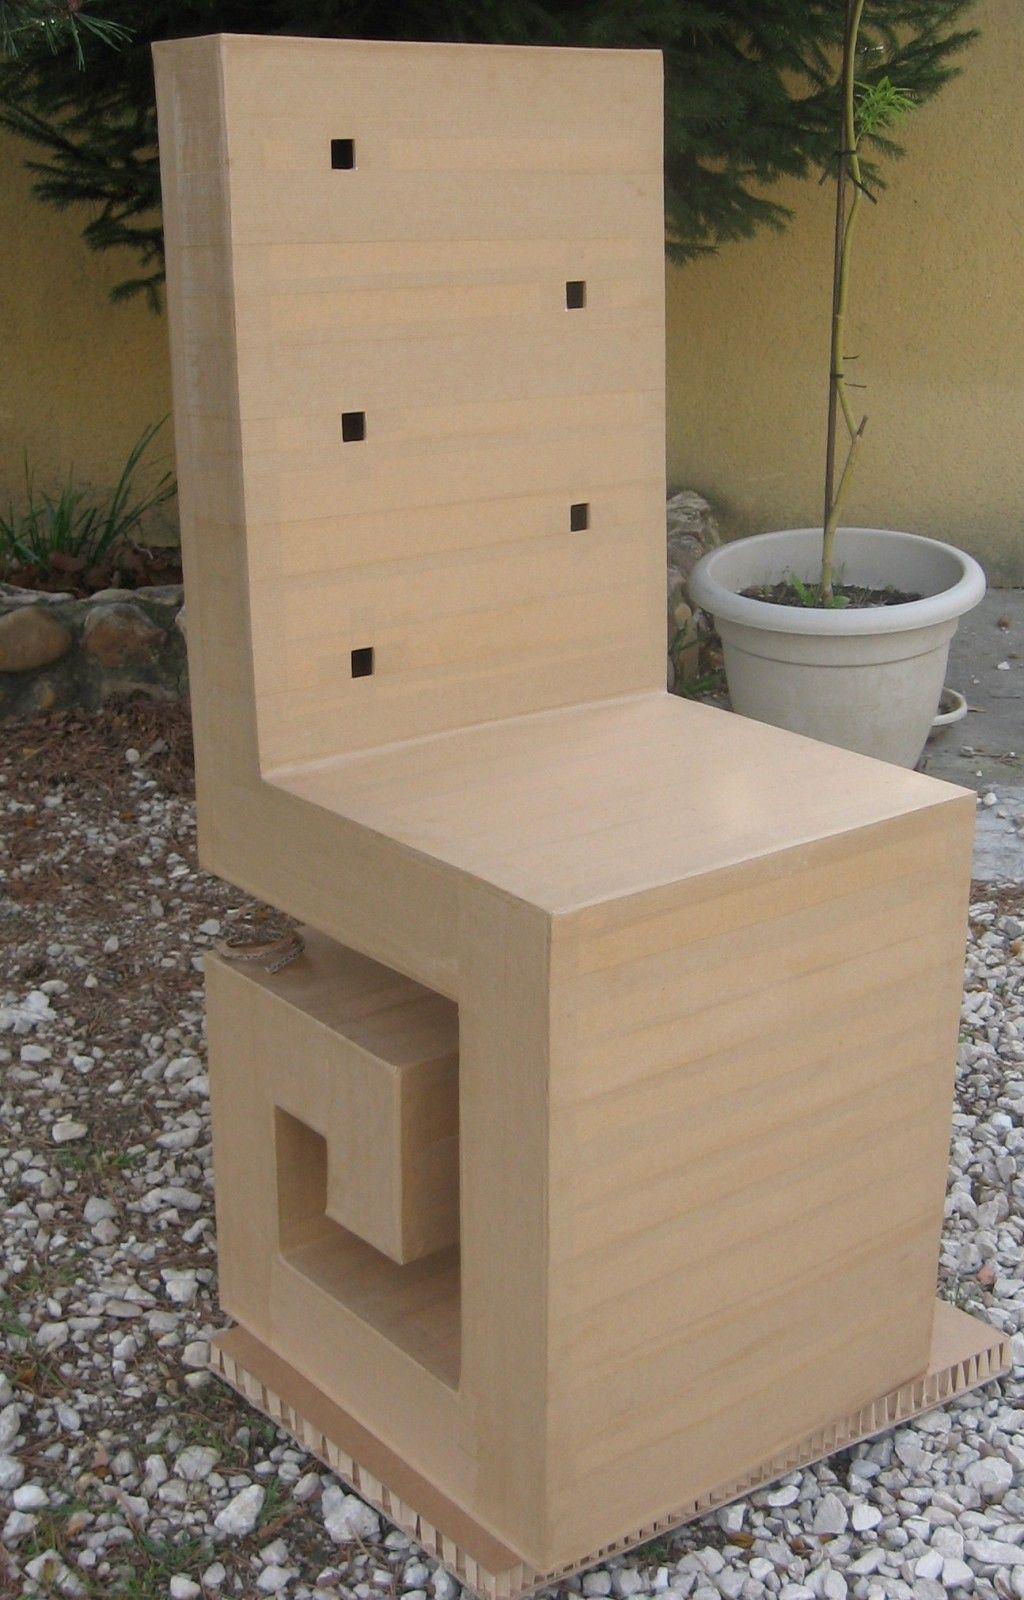 L Avancee Du Siege En Carton Meubles En Carton Marie Krtonne Chaise En Carton Meubles En Carton Mobilier De Salon